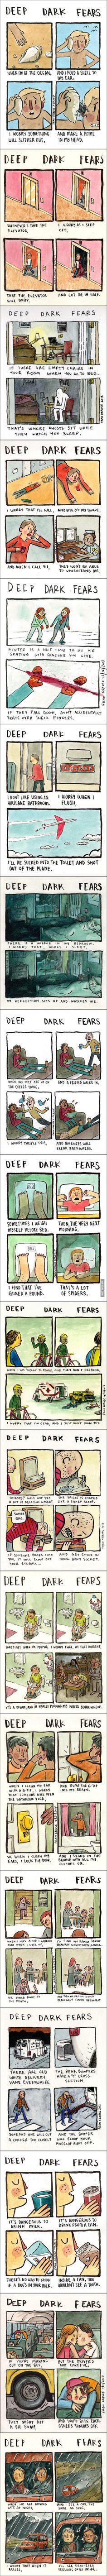 Deep Dark Fears Extended